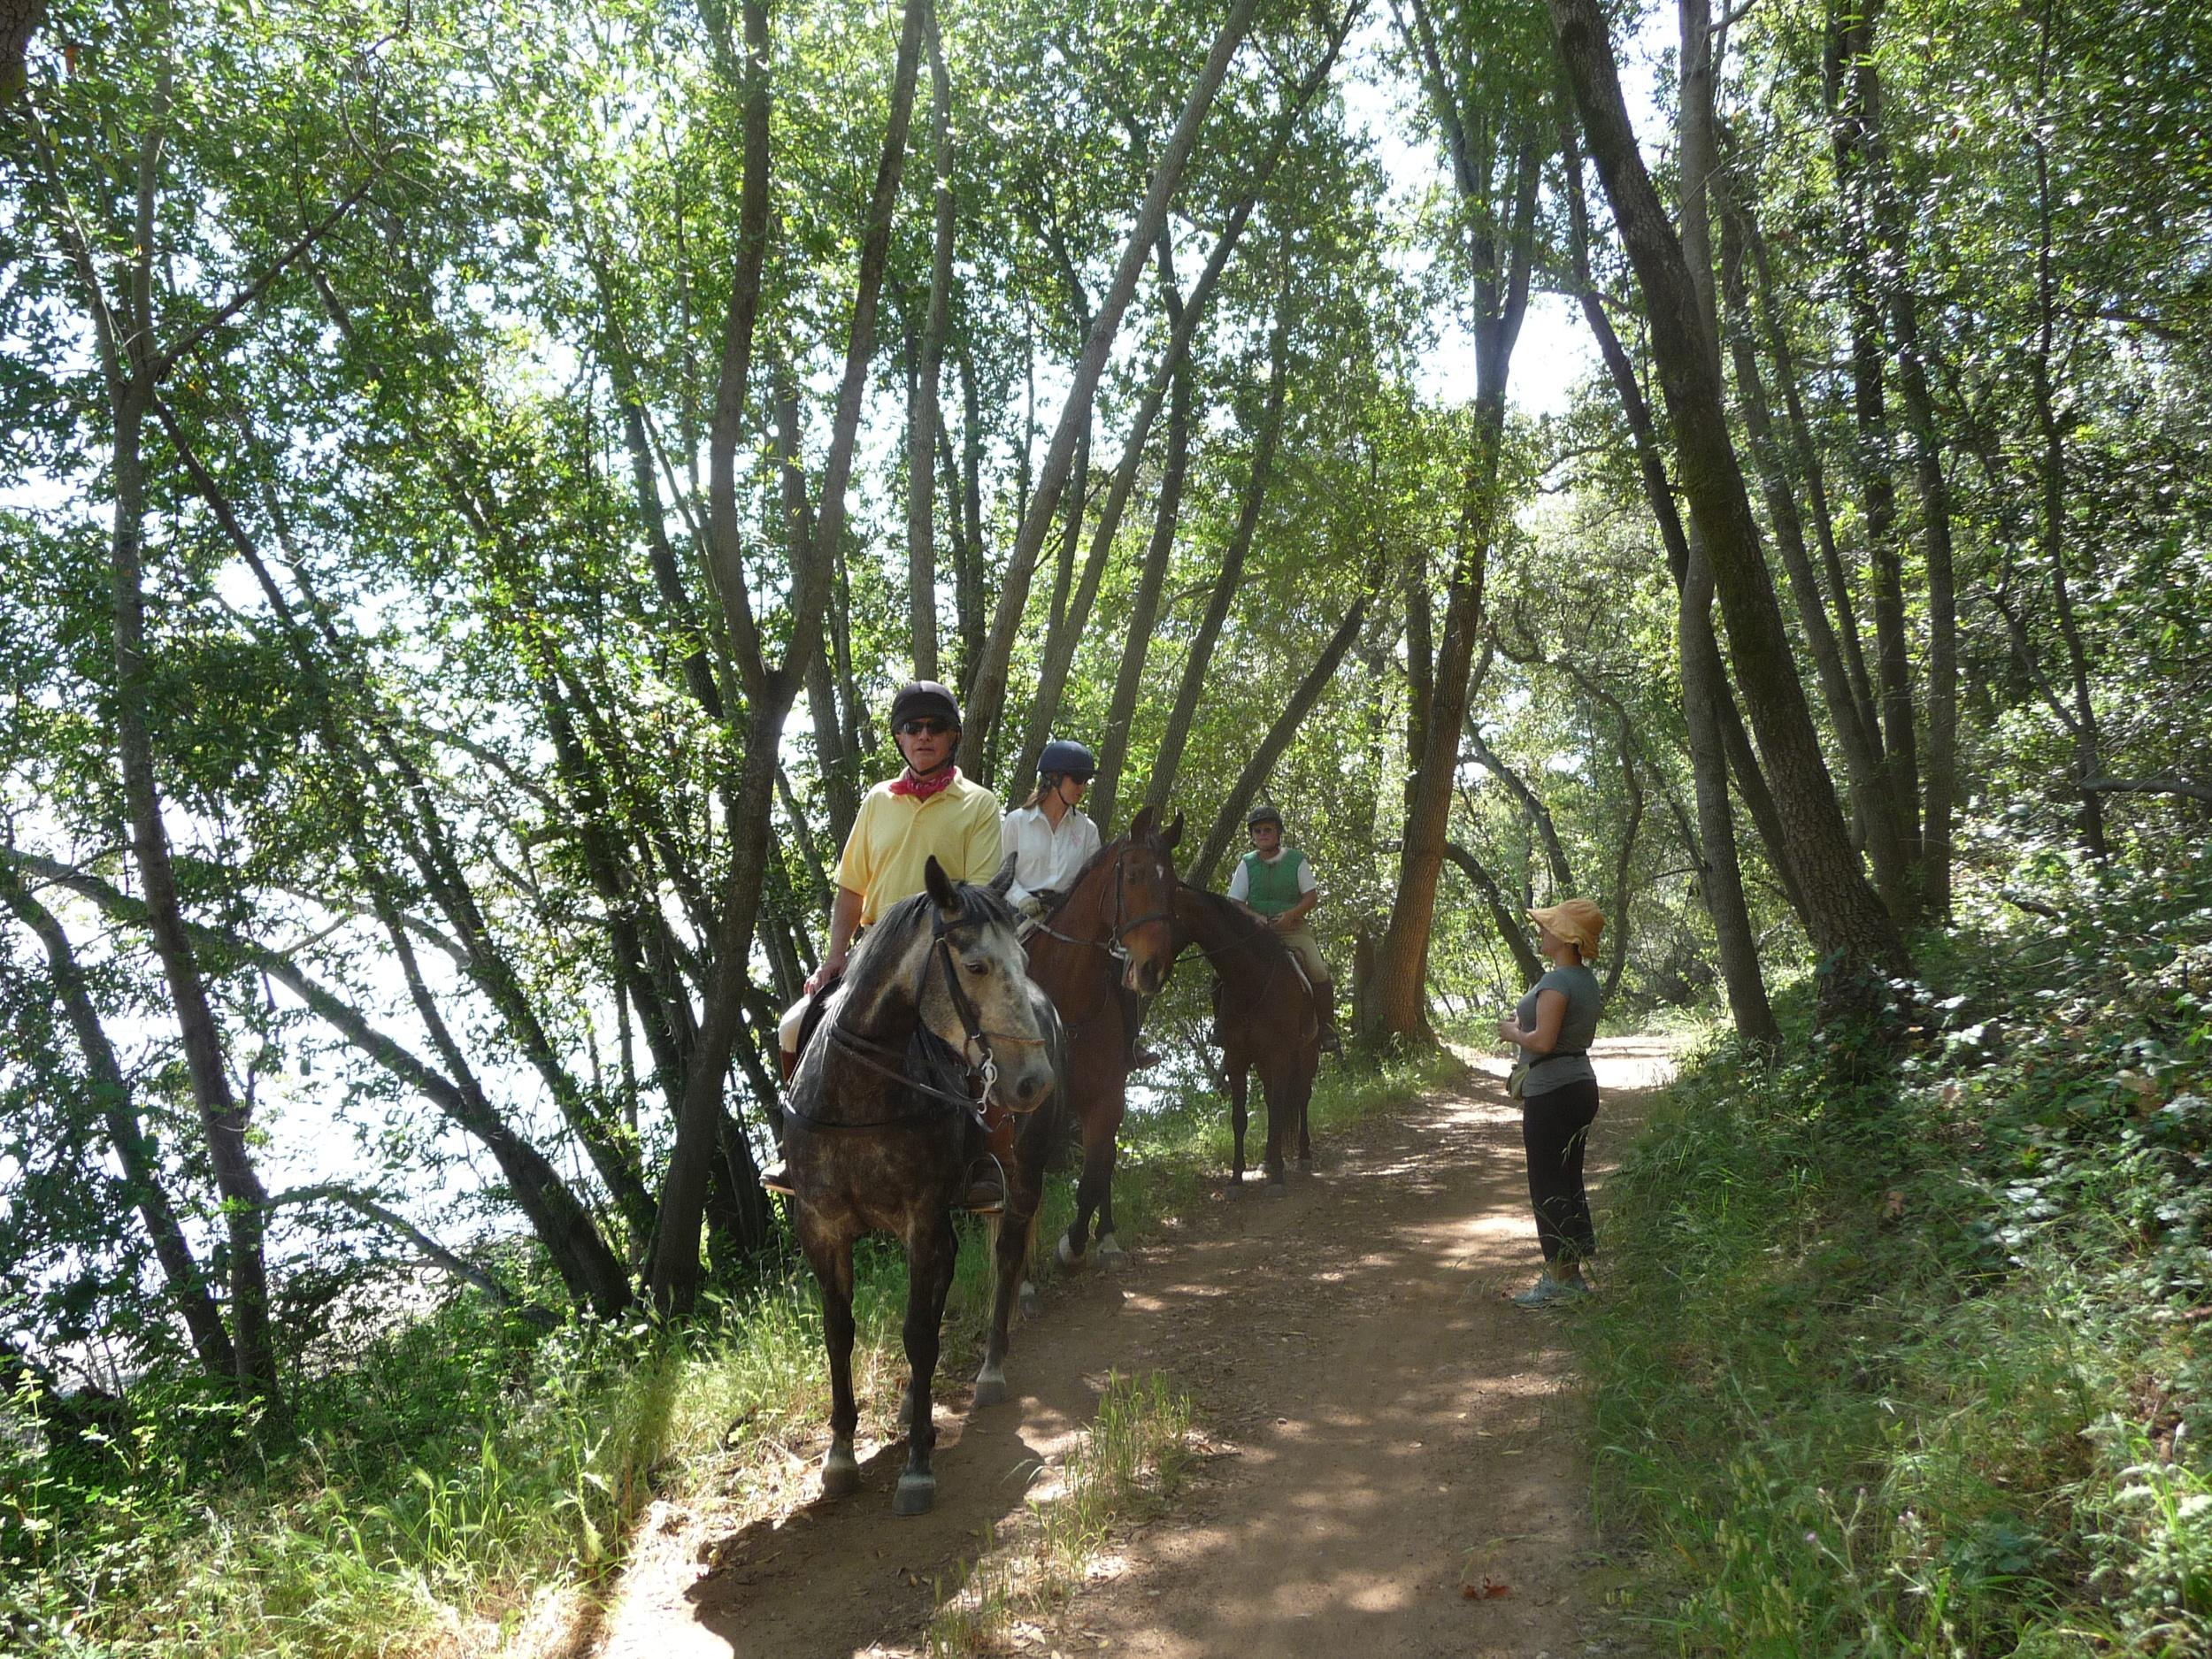 Rush creek horse hiker stop.jpg